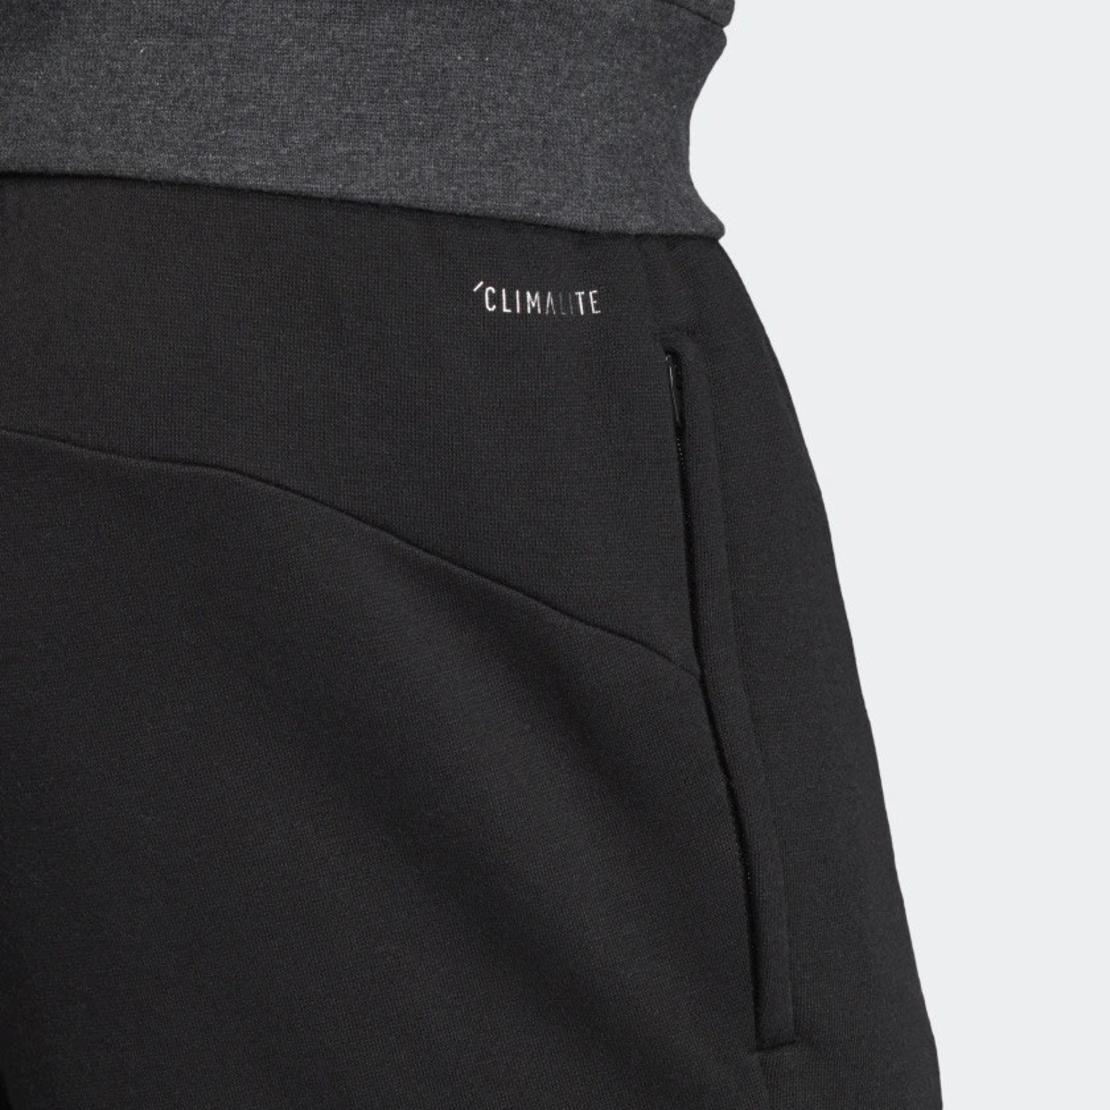 מכנסי אדידס לגברים   Adidas Designed 2 Move Climalite Pants